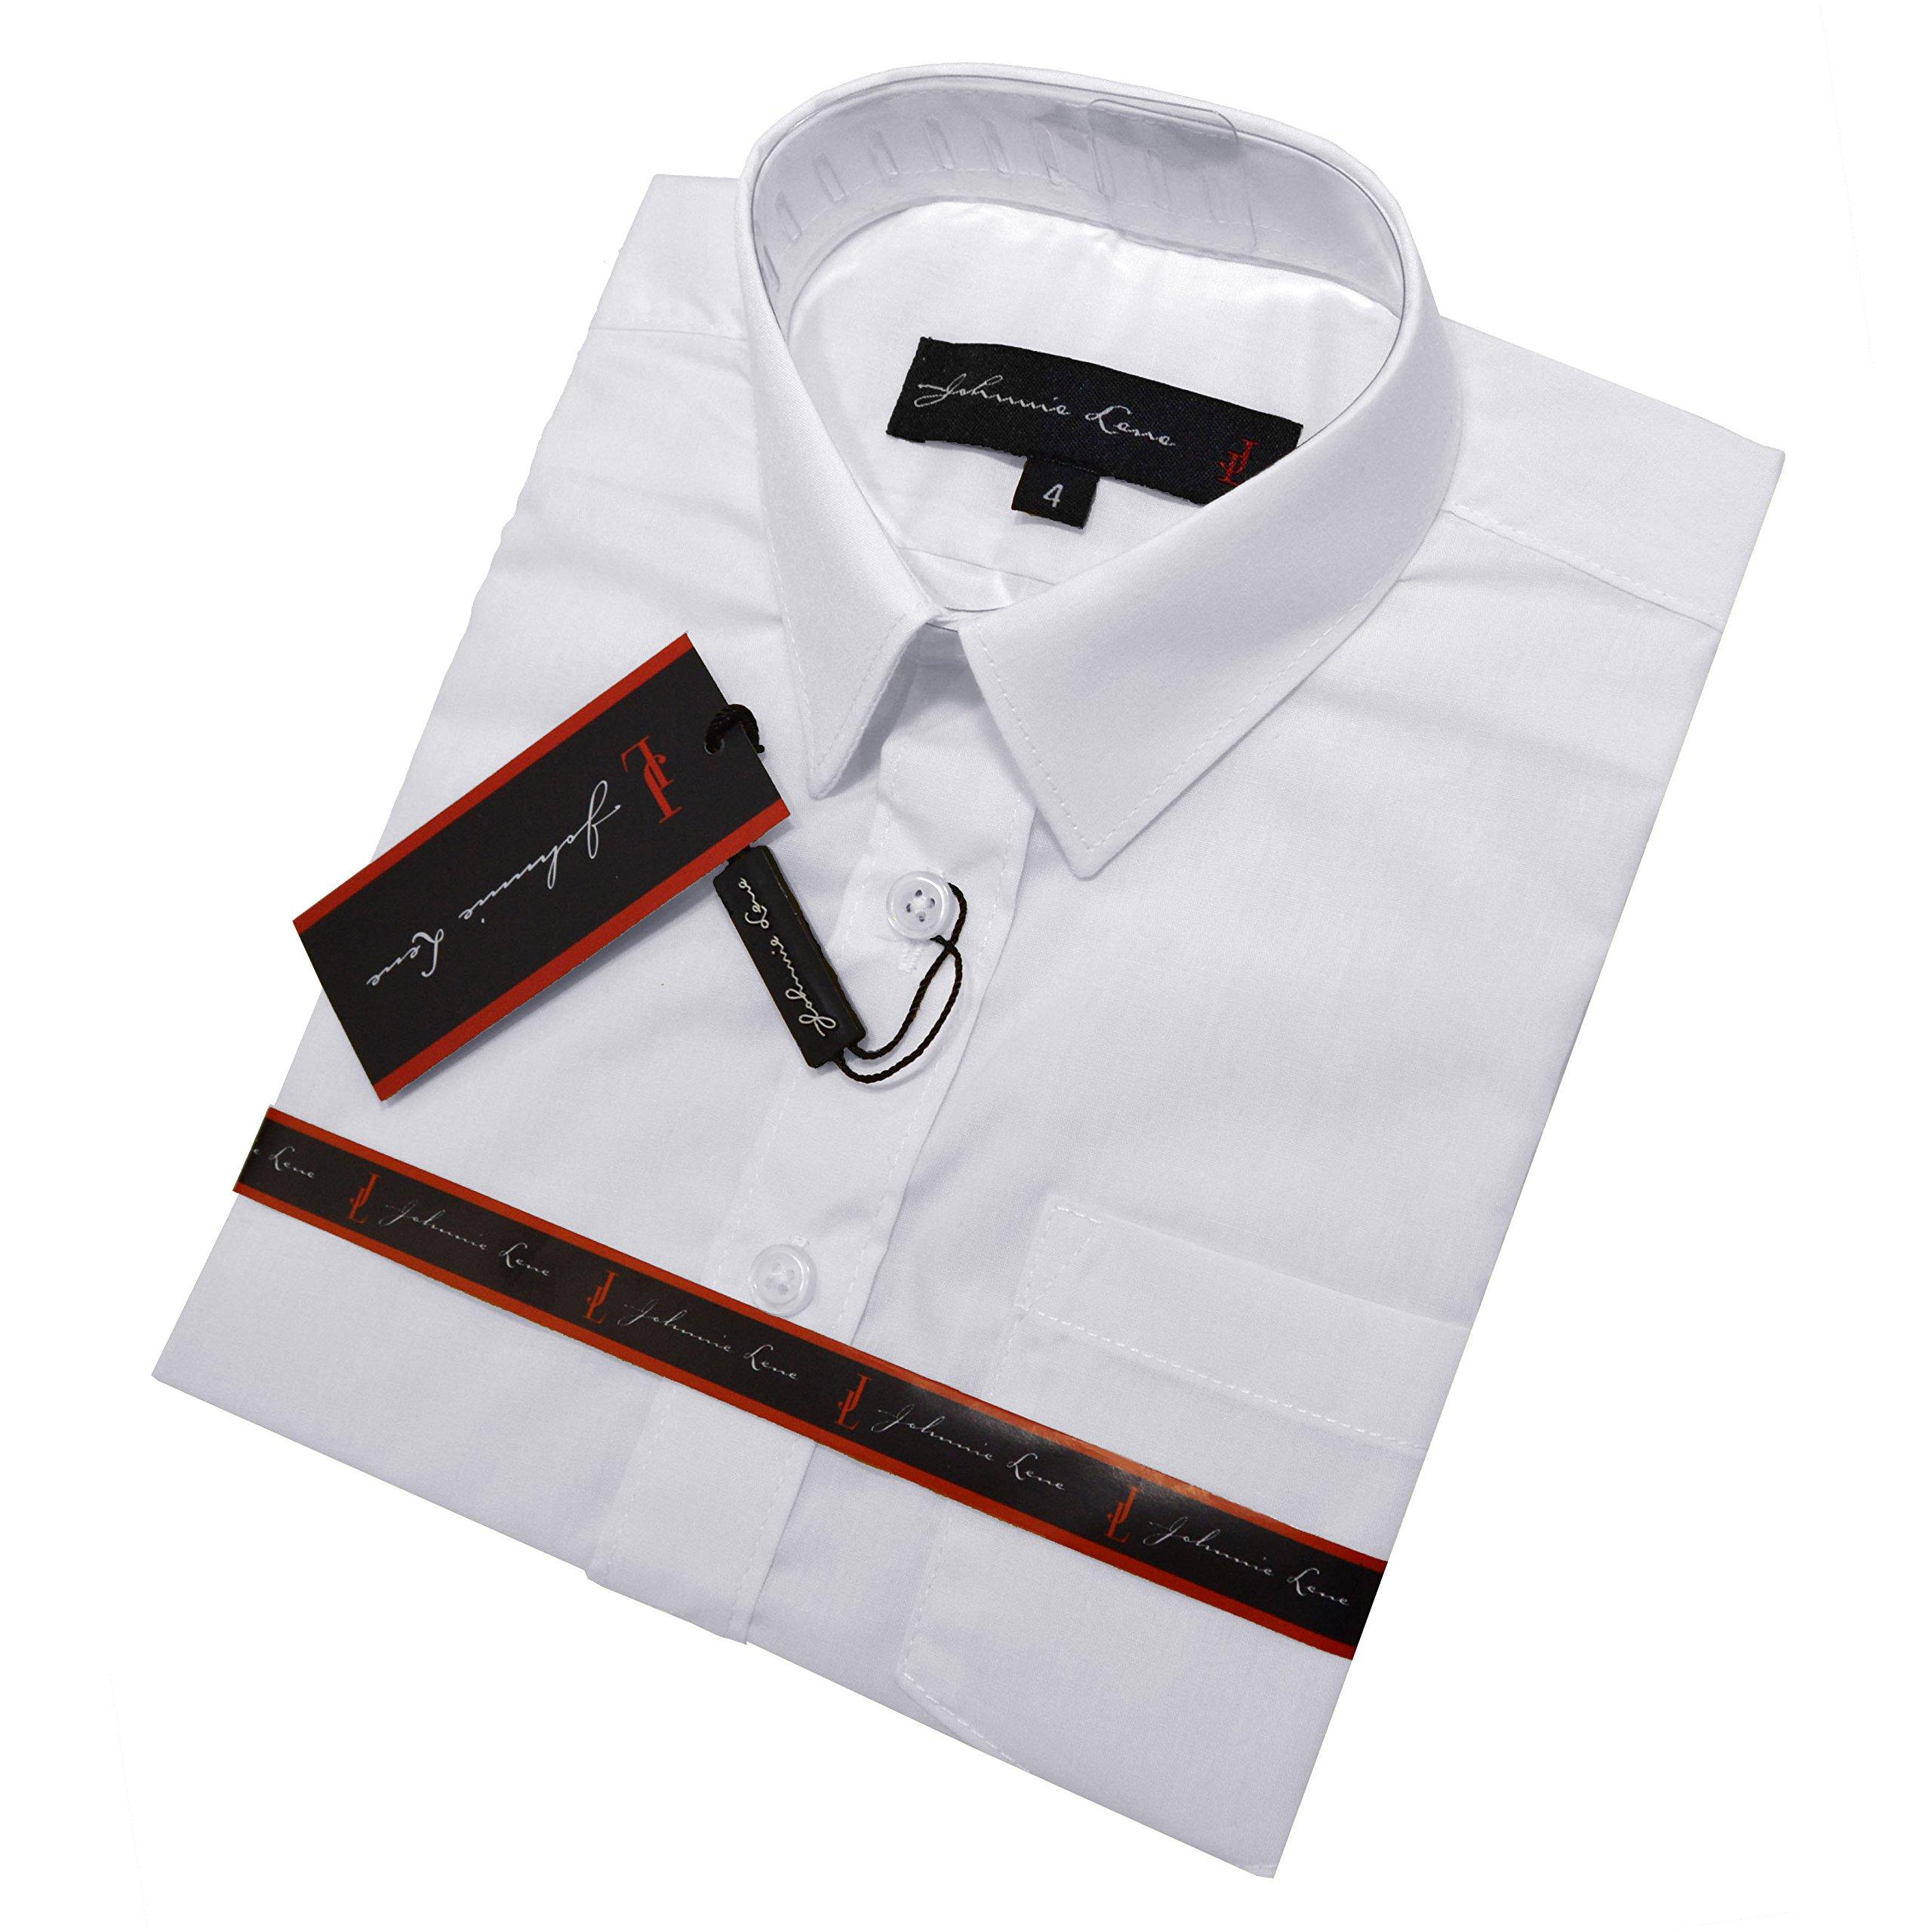 Johnnie Lene Boys Short Sleeves Solid Dress Shirt #JL44 (10, White) by Johnnie Lene (Image #2)